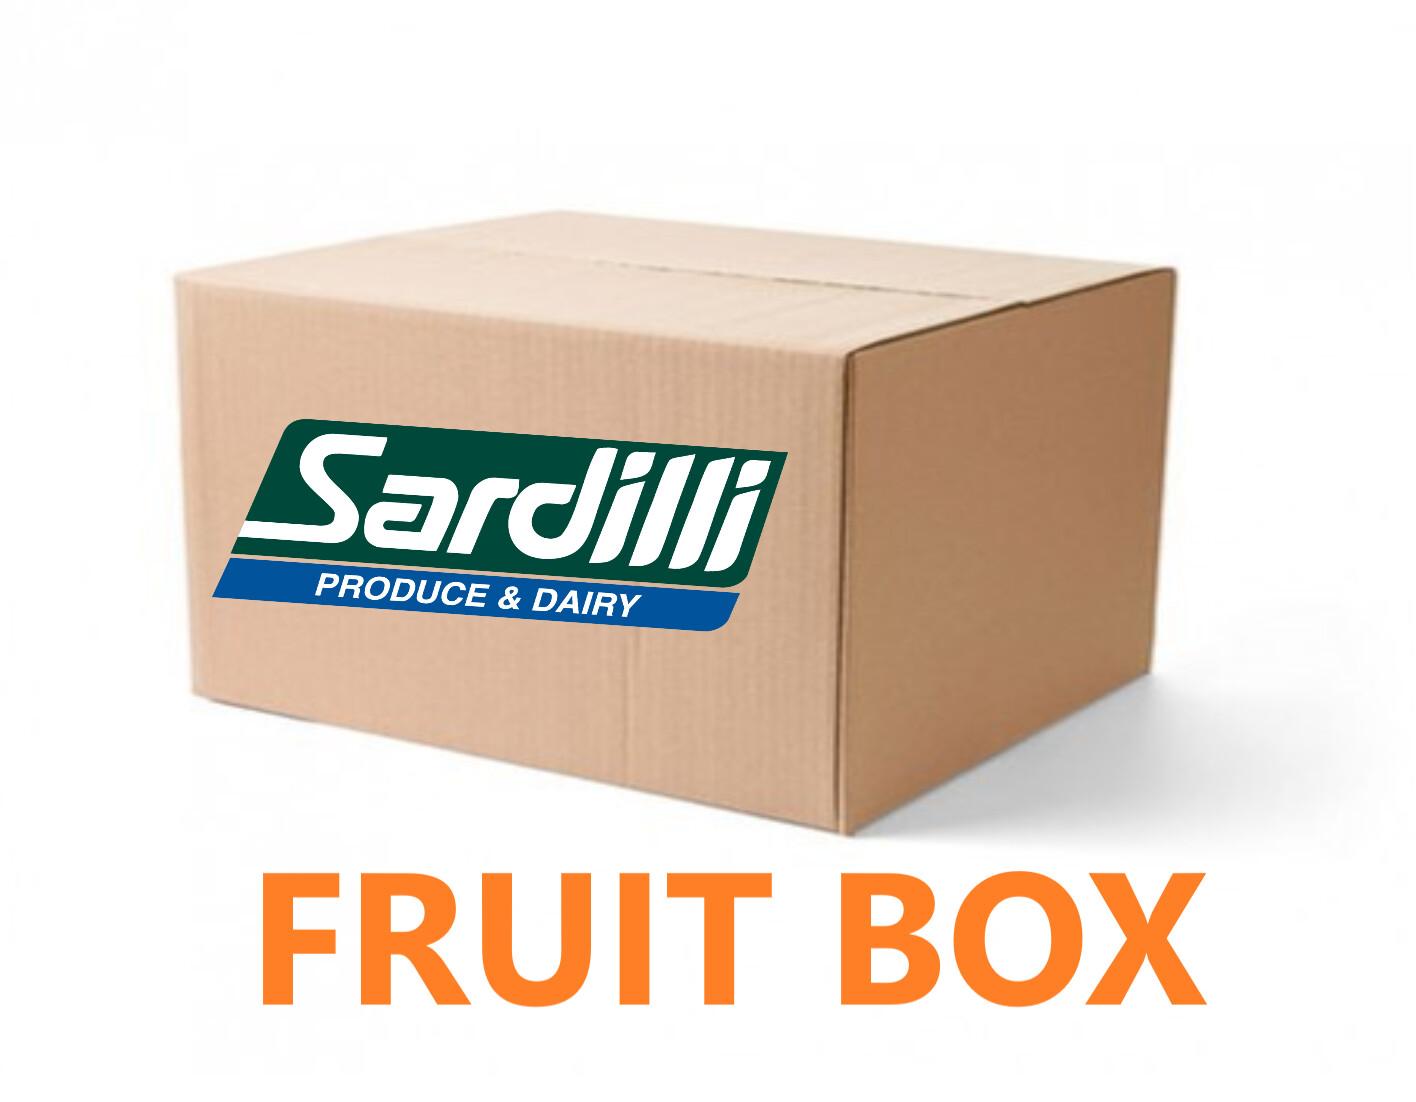 FRUIT BOX -